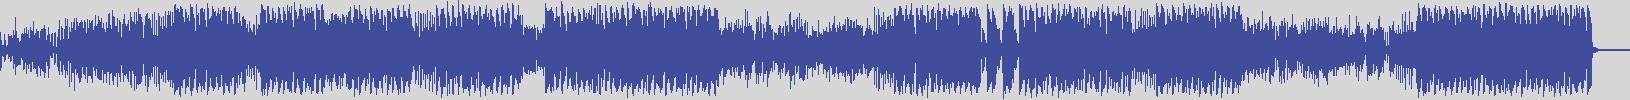 smilax_dig_records [SDR001] El Trio Perfecto - Ven Pegate [Original Mix] audio wave form